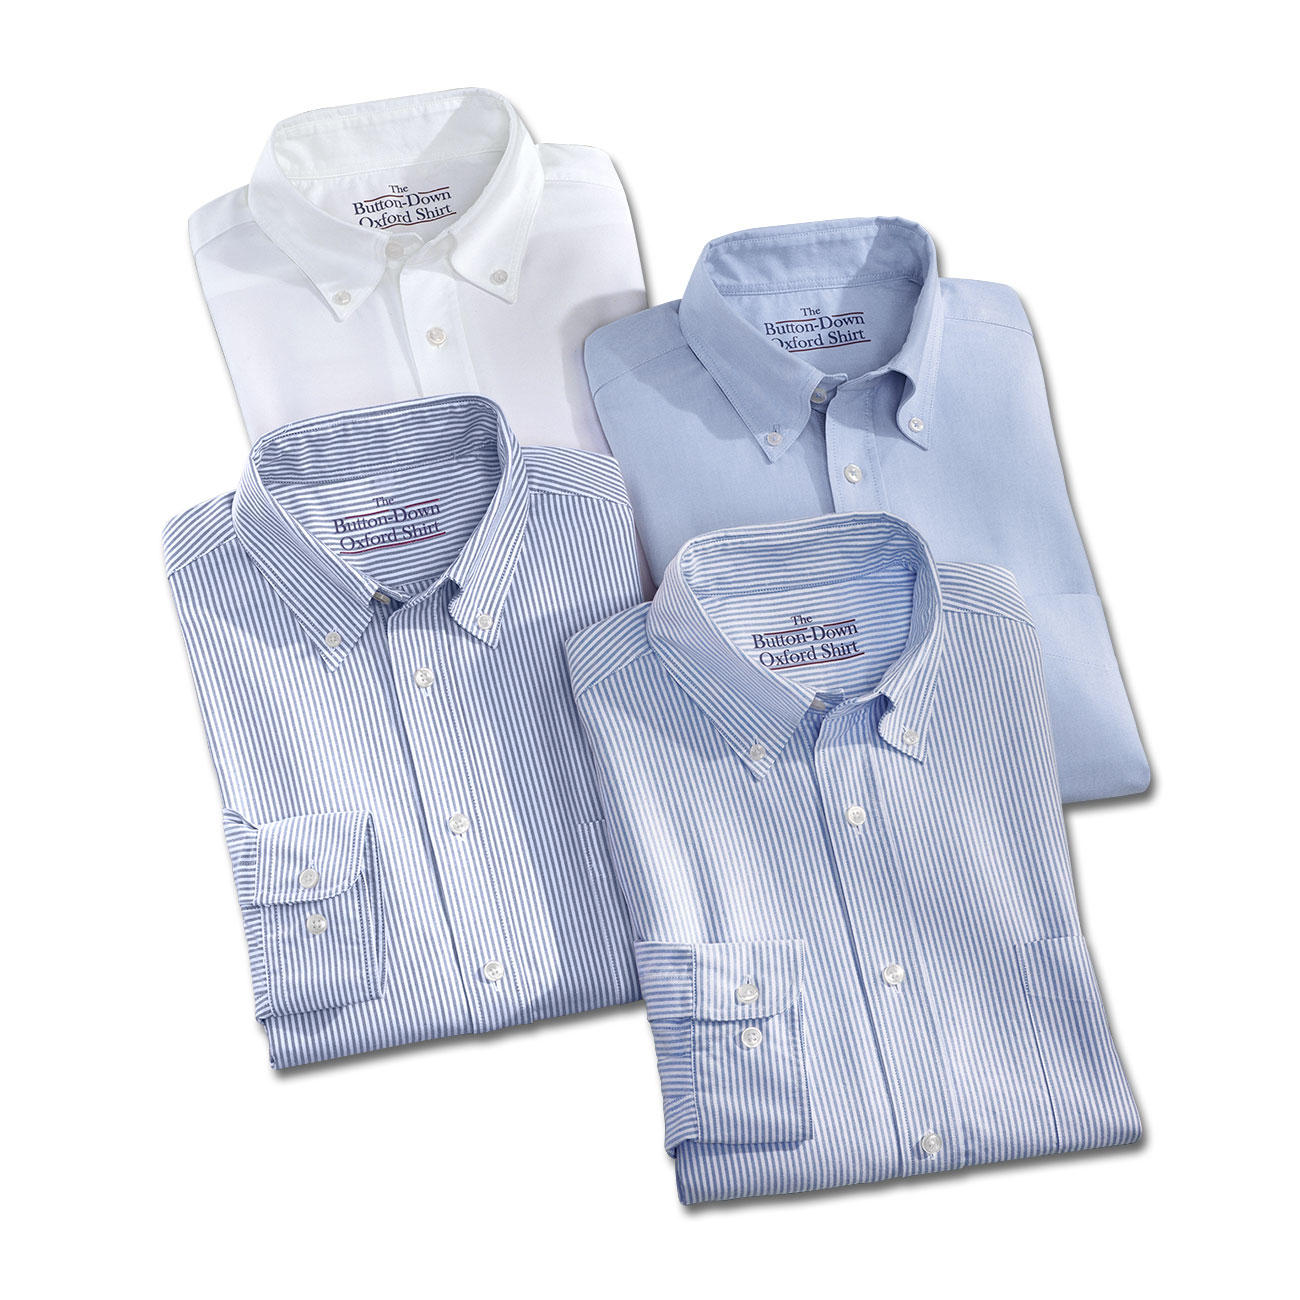 The BDO-Shirt, Basic Collection | Klassiker entdecken